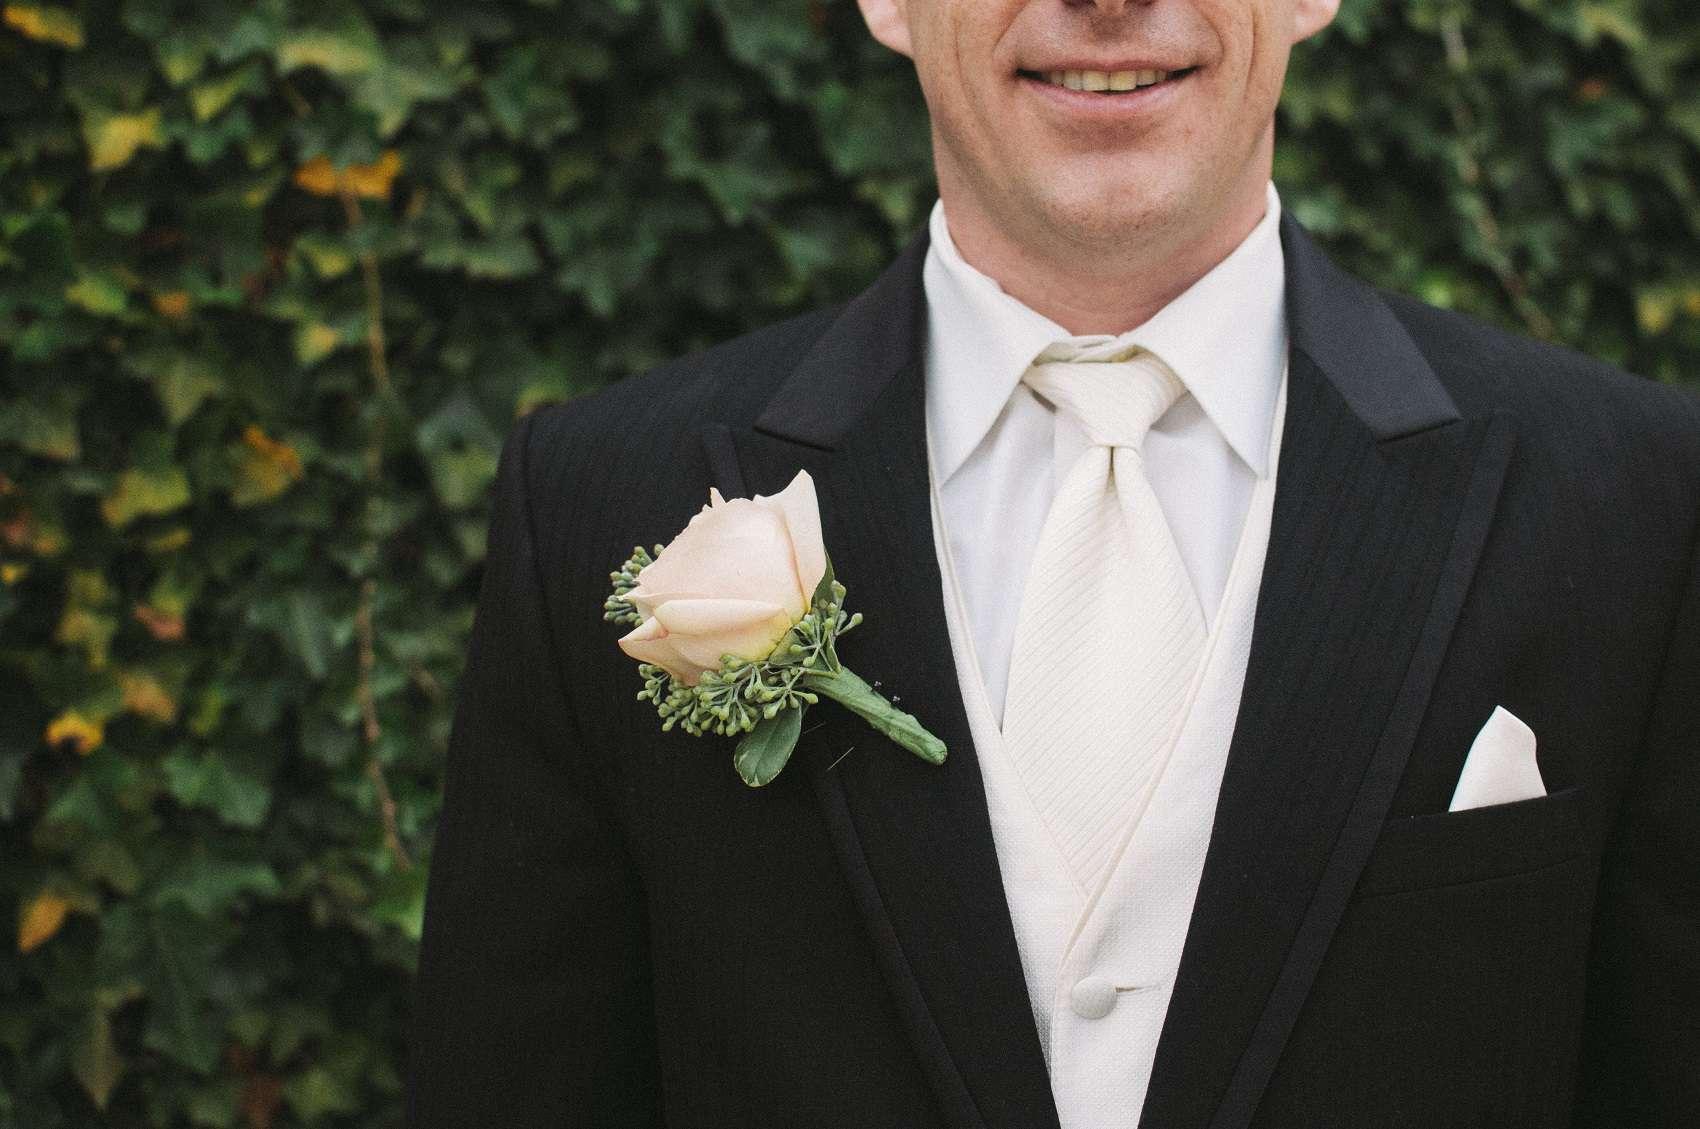 Wowdoplňky kravata světlá